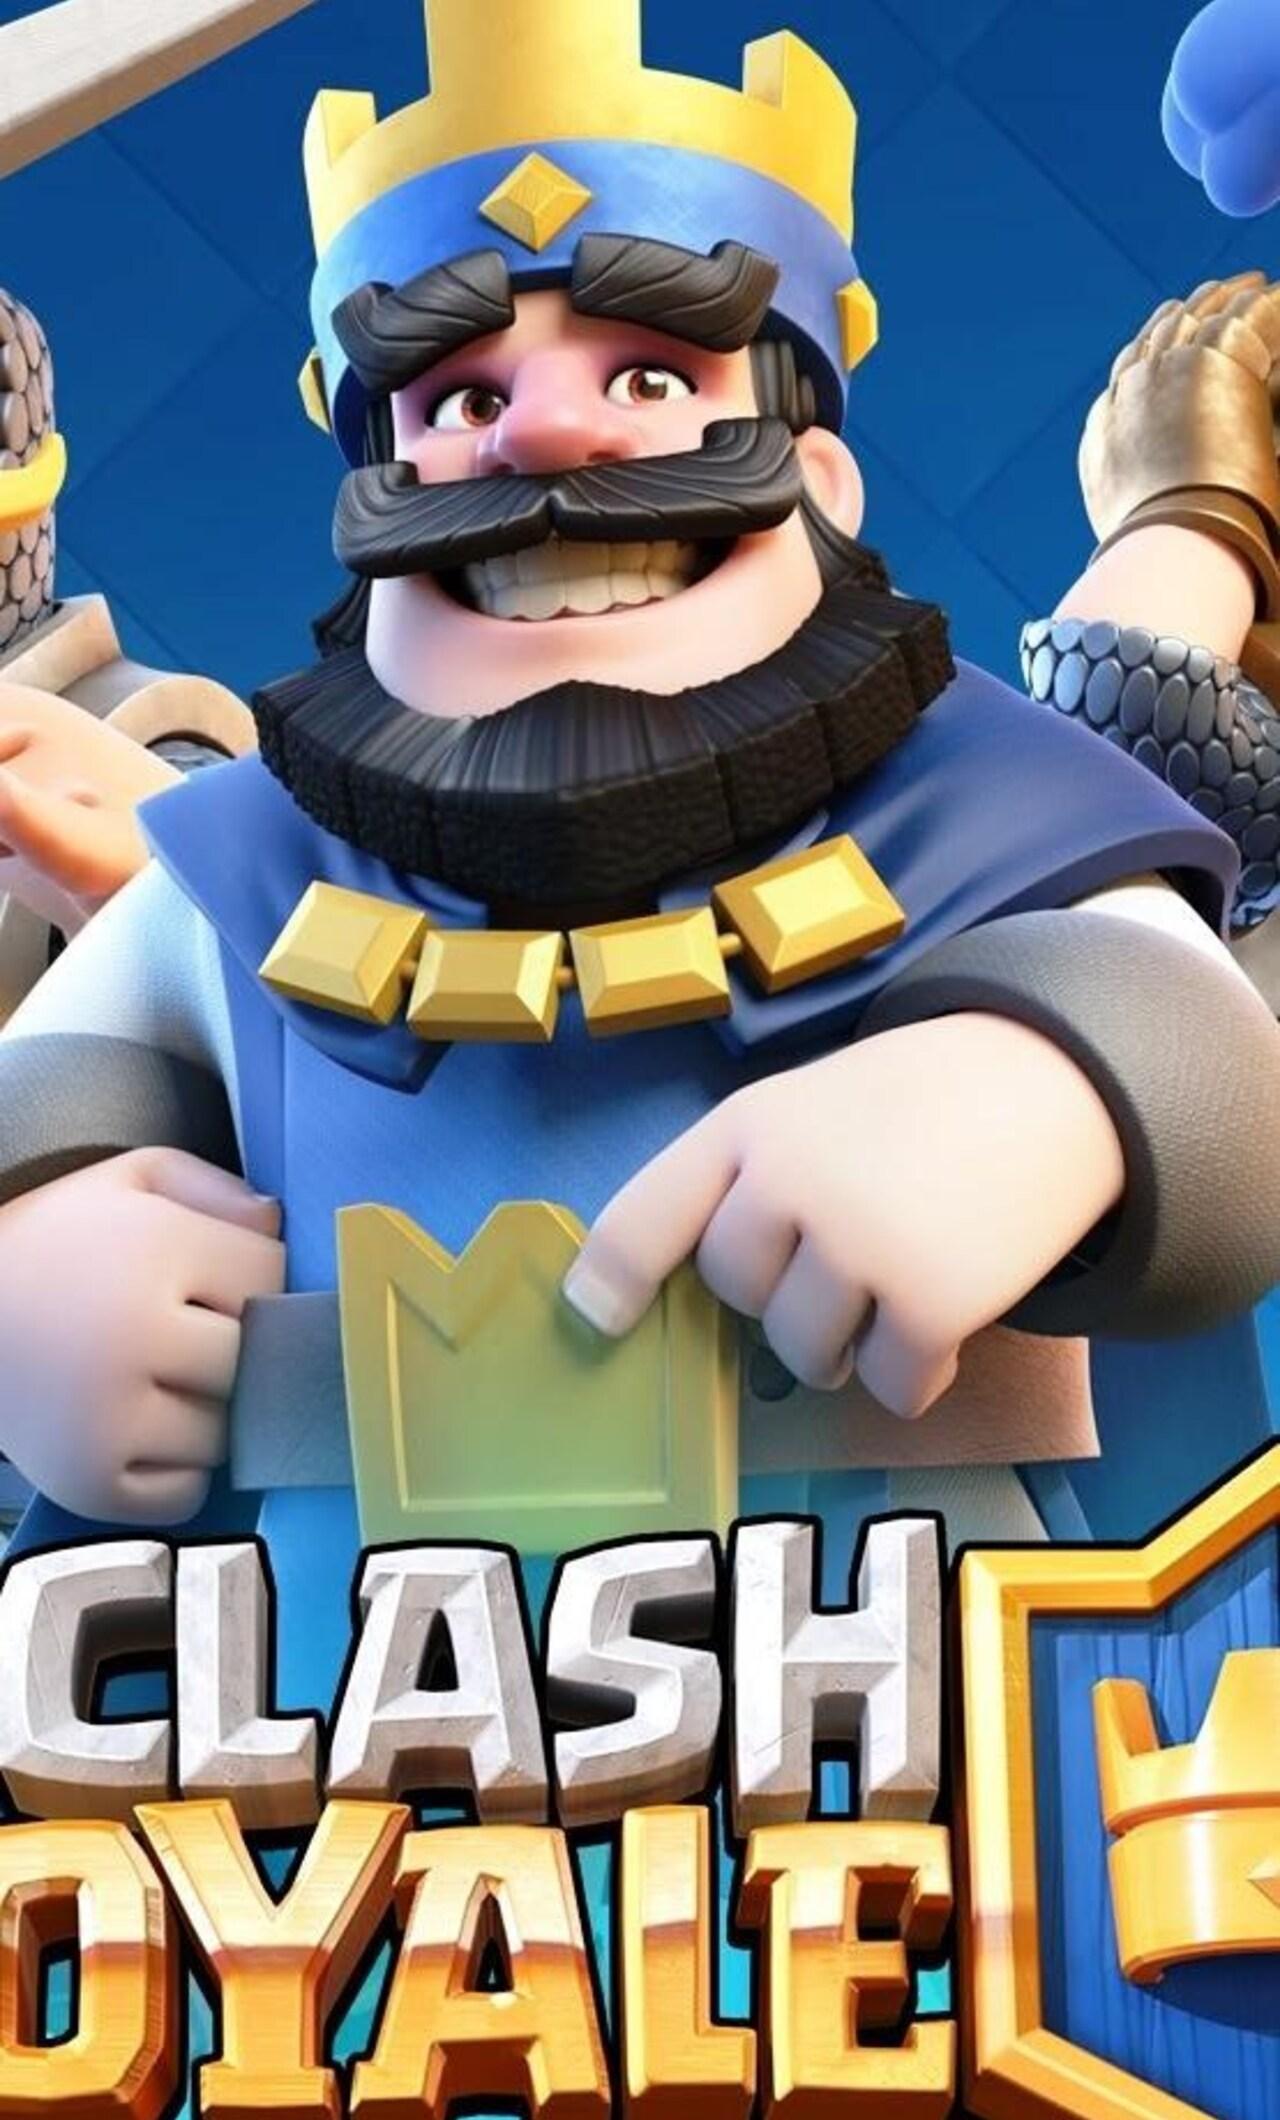 supercell-clash-royale-hd-qhd.jpg